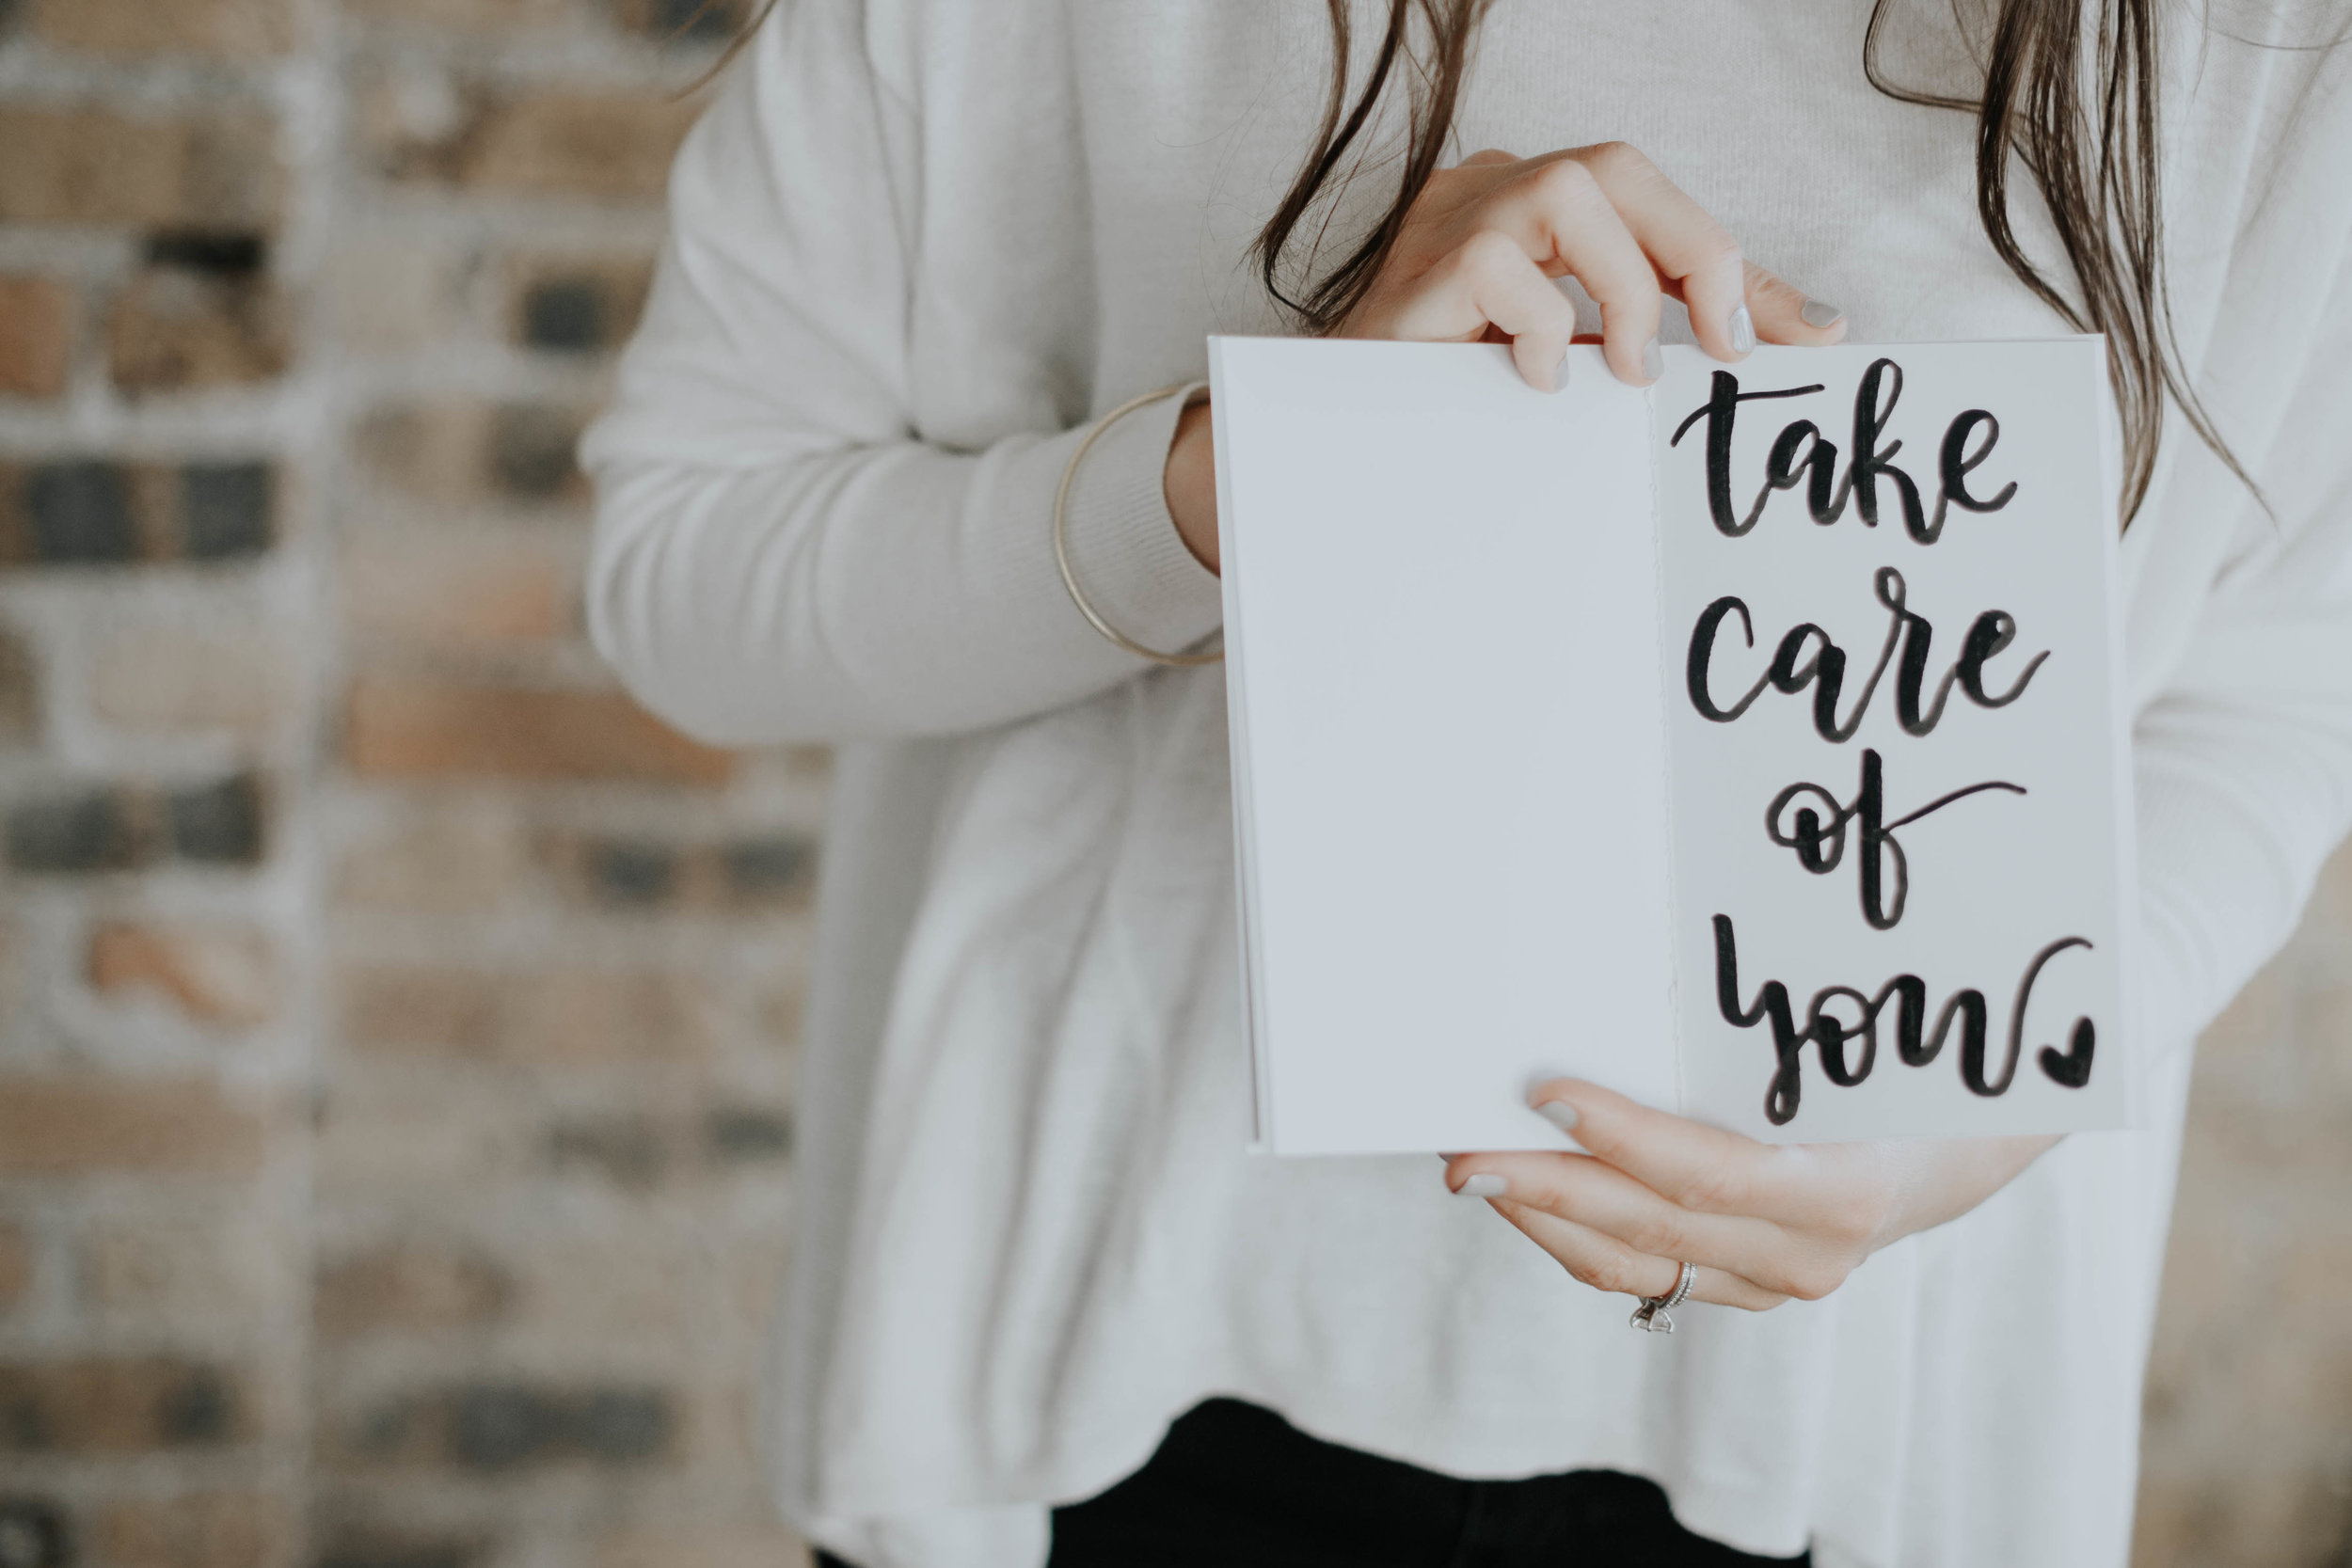 A self-care blog.jpg